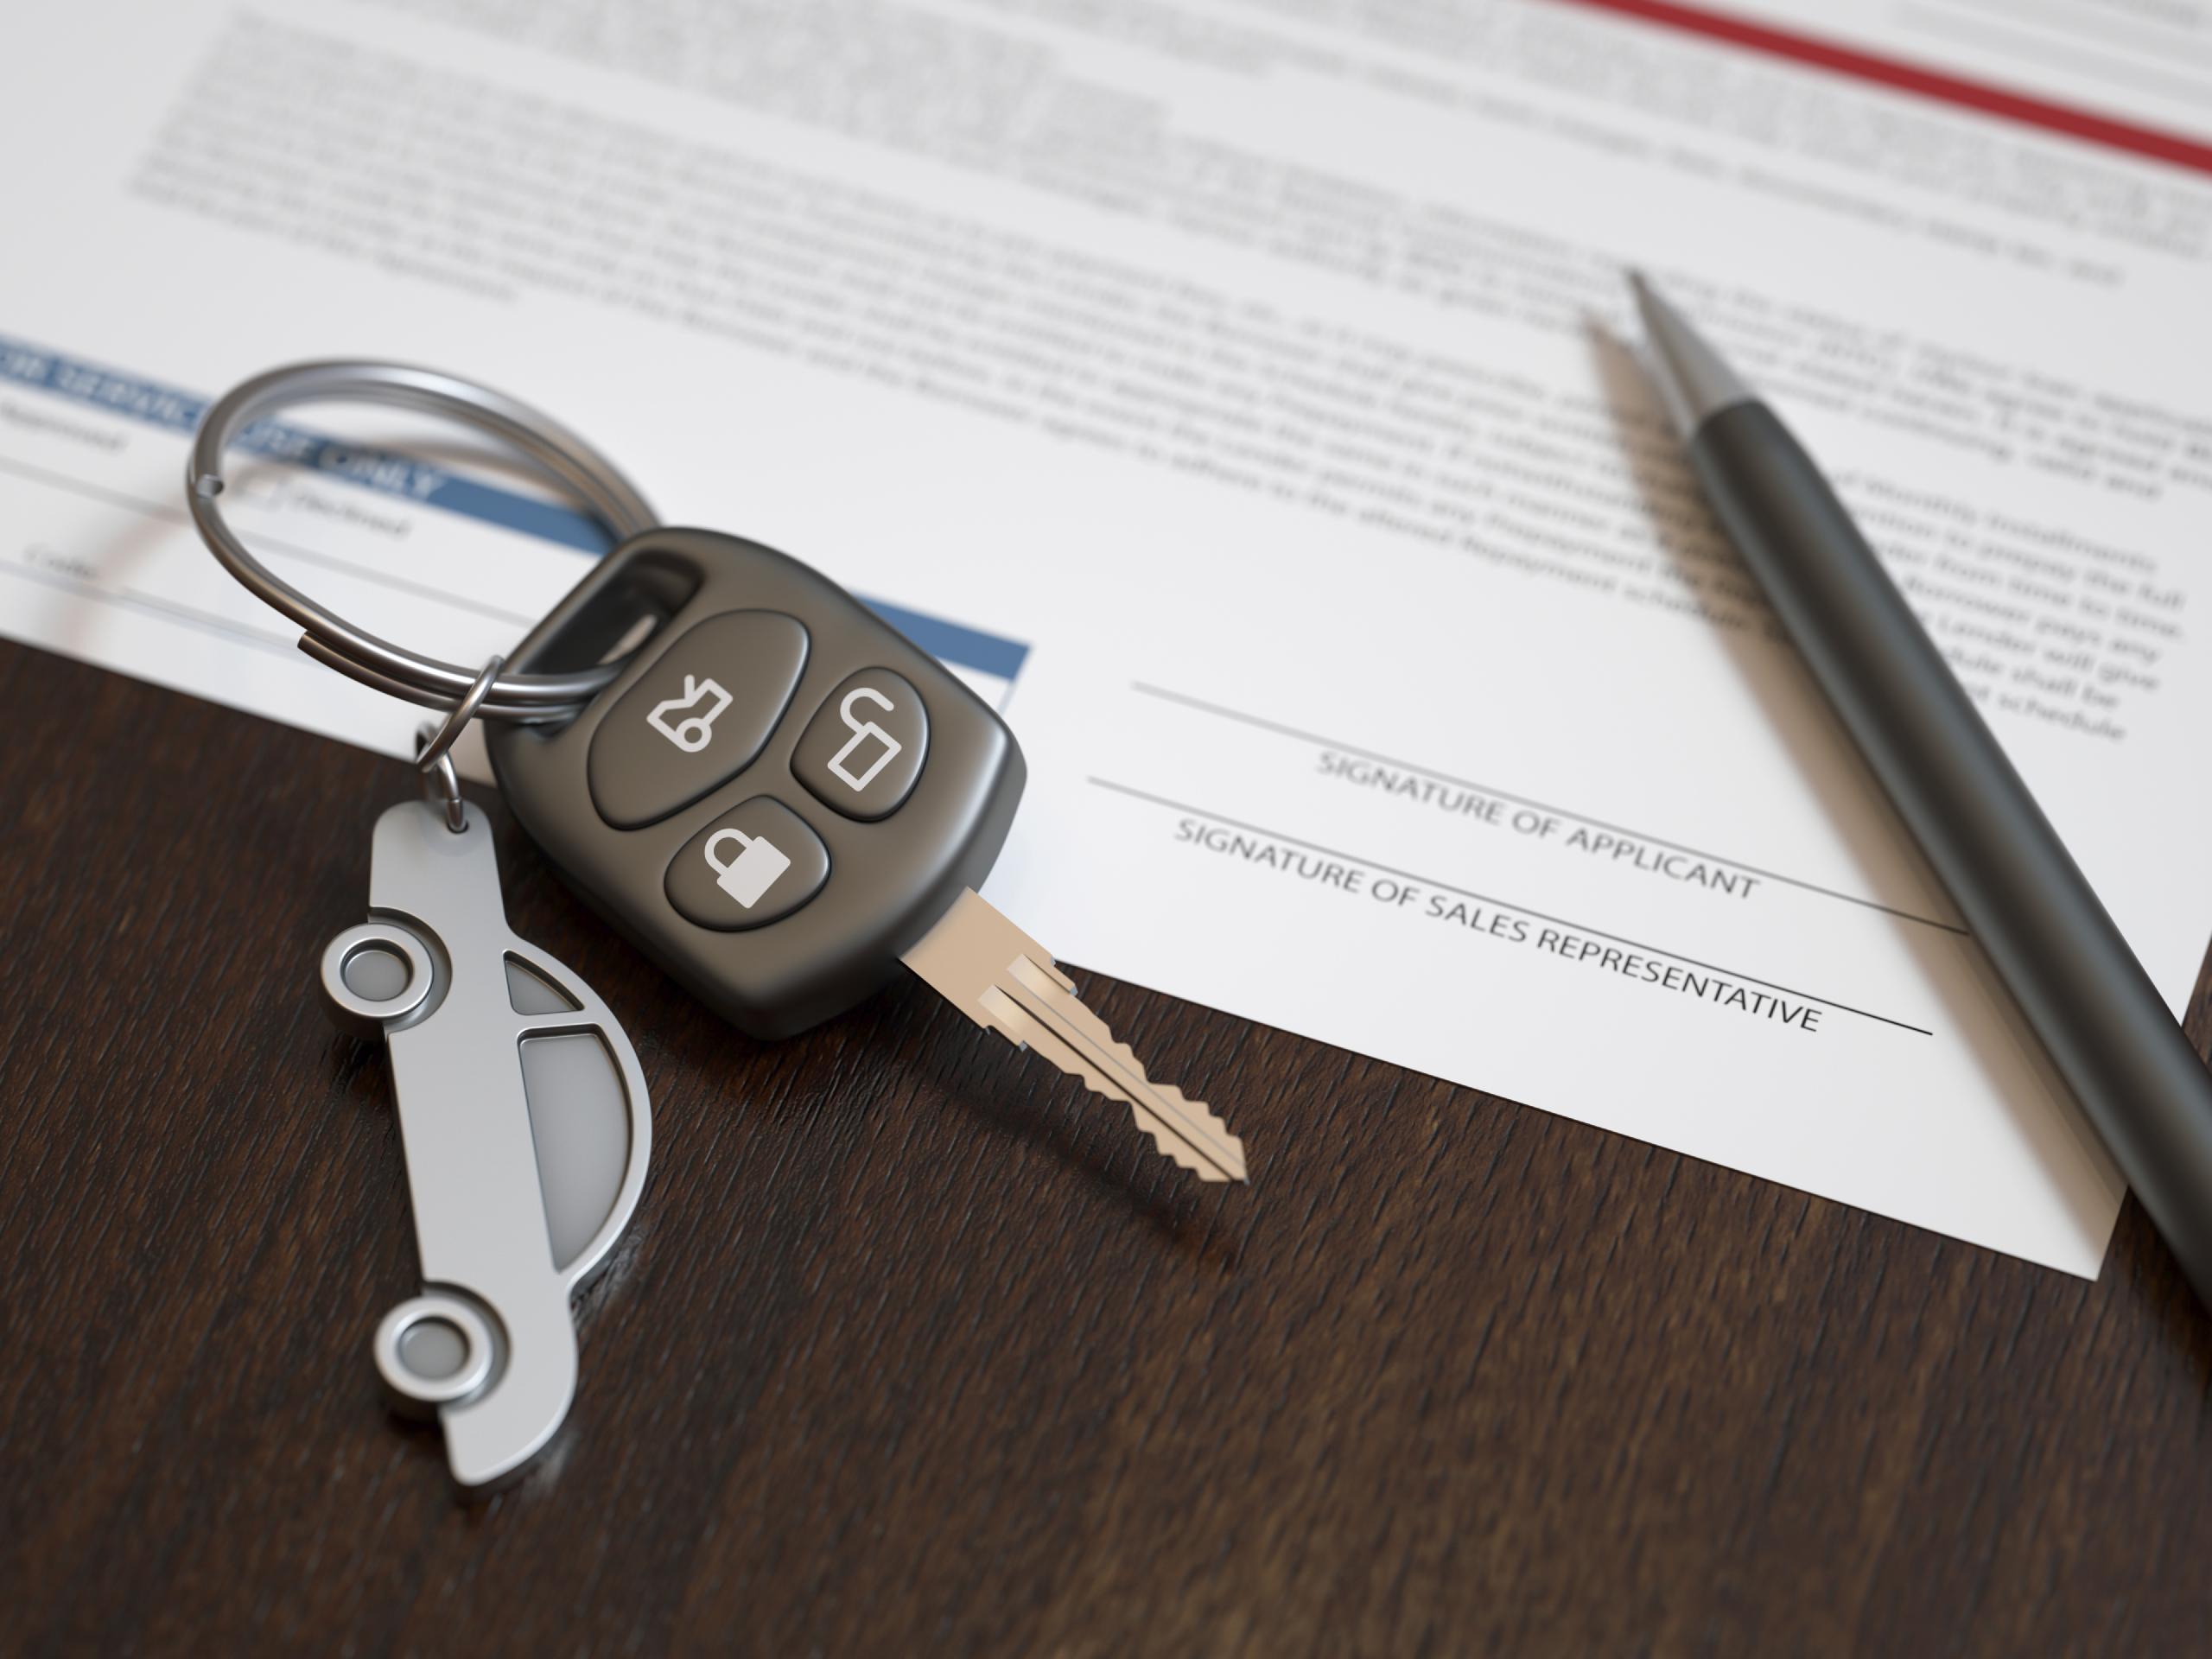 Grandes ofertas de leasing de Chevrolet cerca de Fairfax, VA